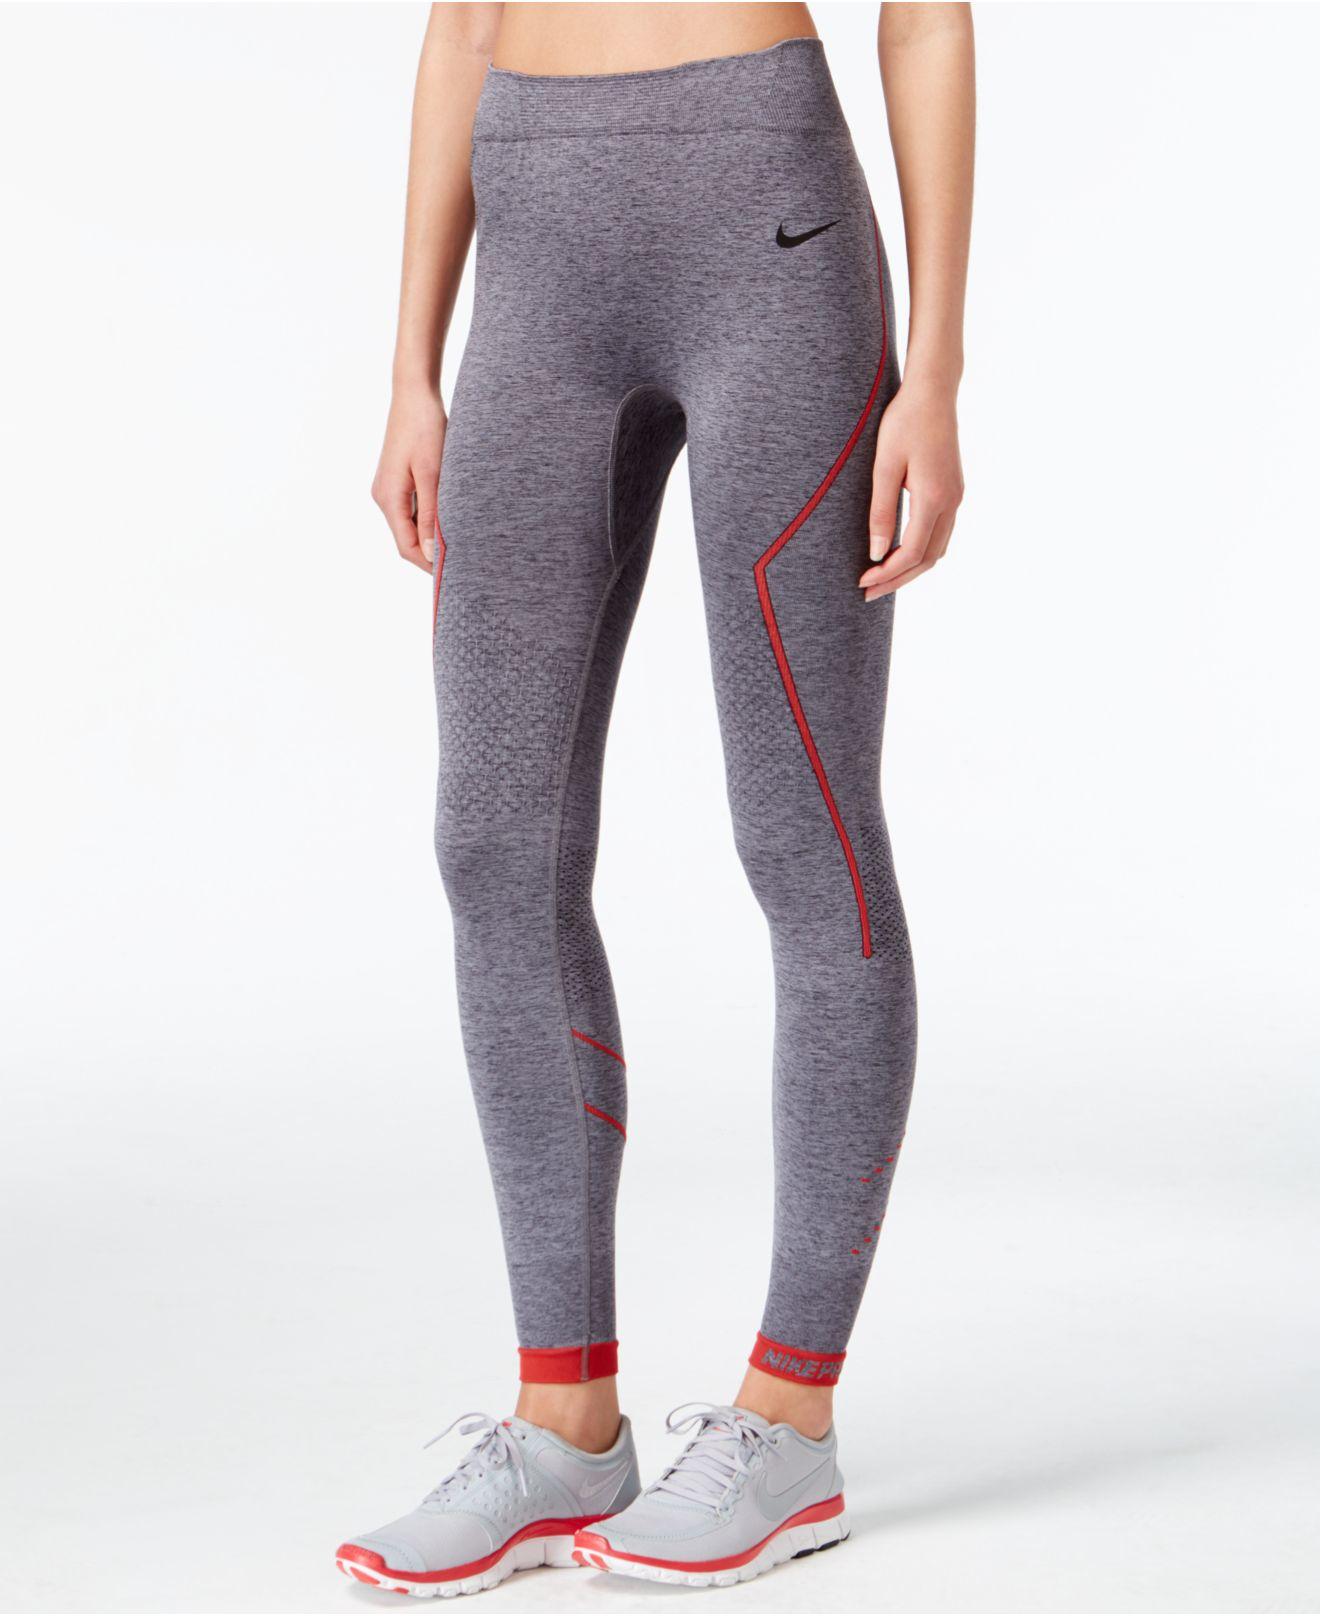 34bf14e50e9a4 ... Lyst - Nike Pro Hyperwarm Limitless Leggings in Black ...